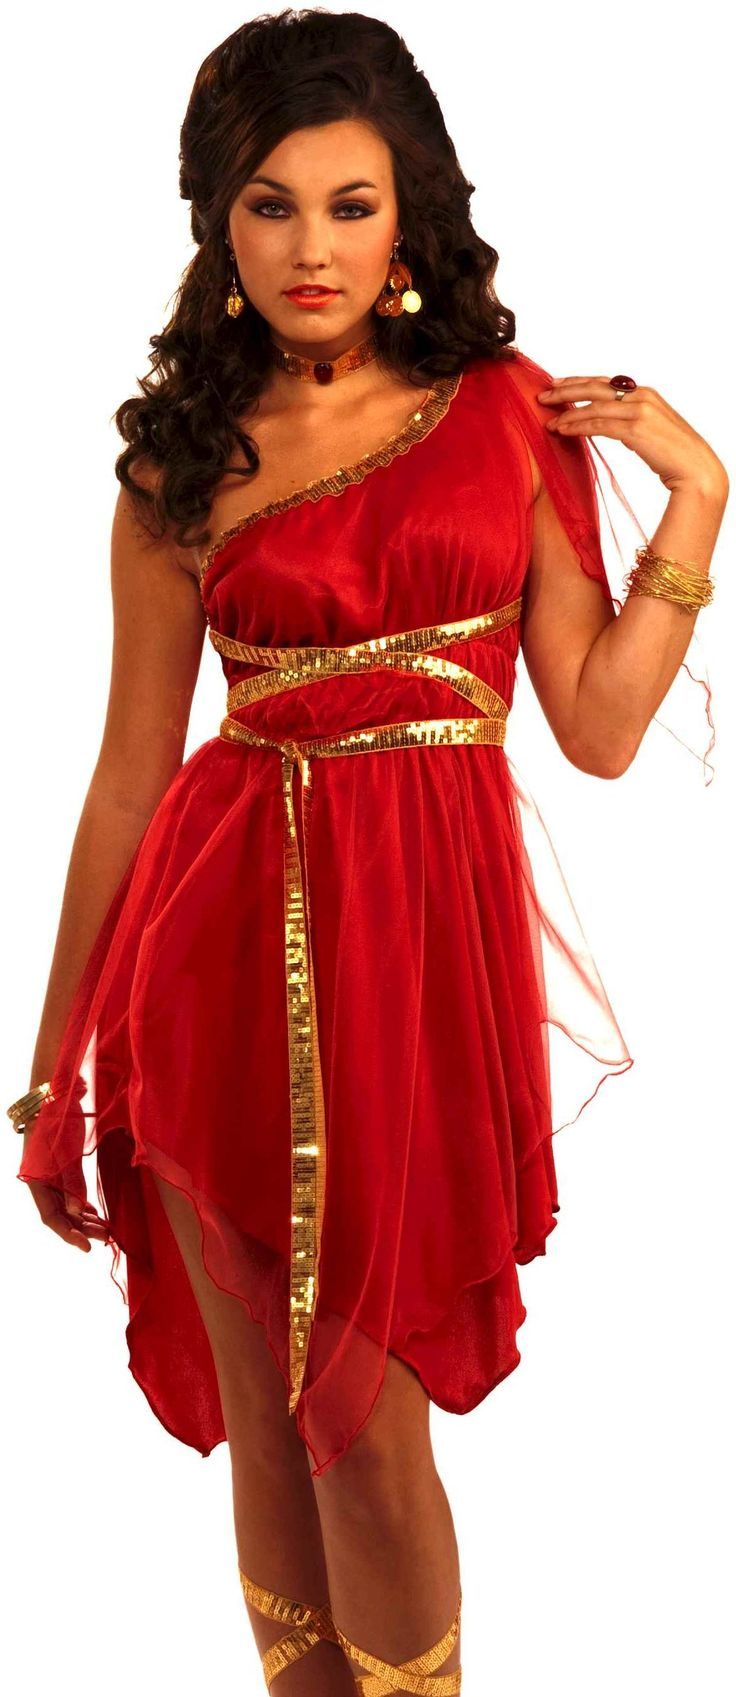 78 best dresses images on Pinterest | Formal prom dresses, Long prom ...